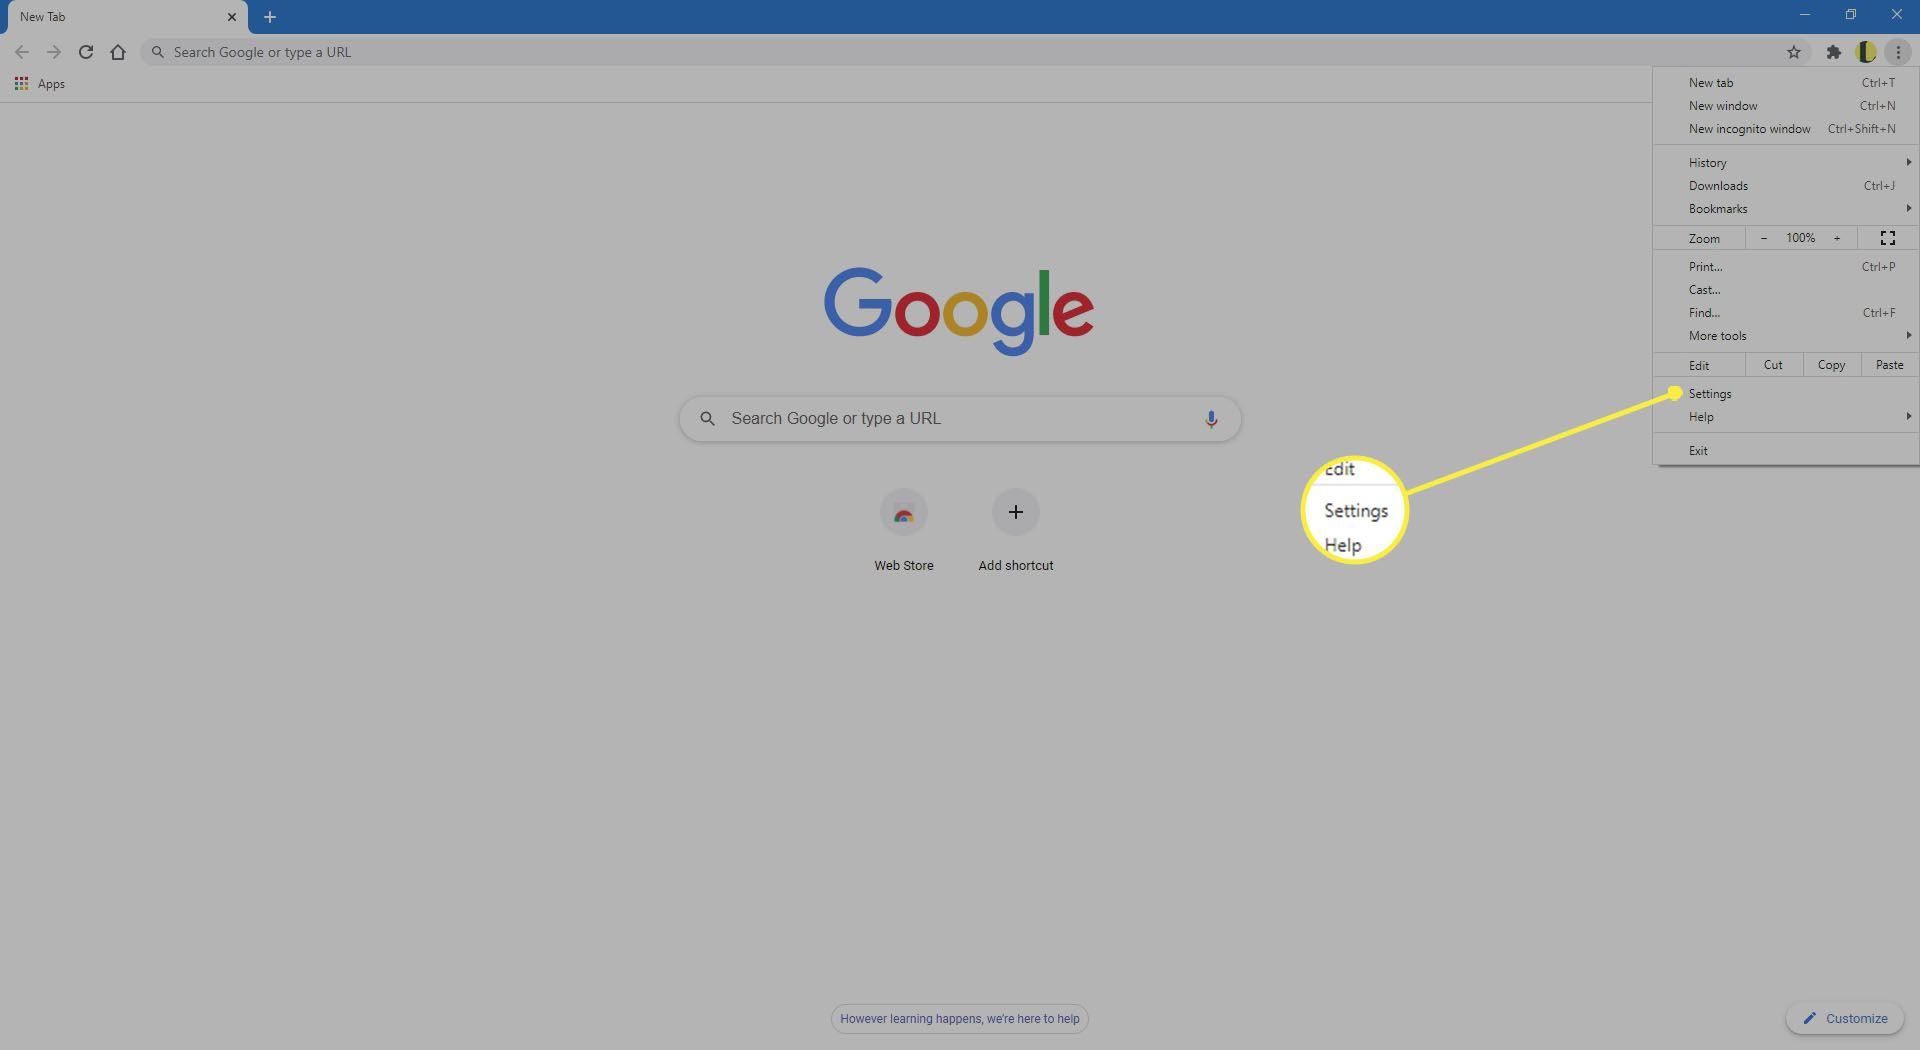 Chrome menu showing Settings location